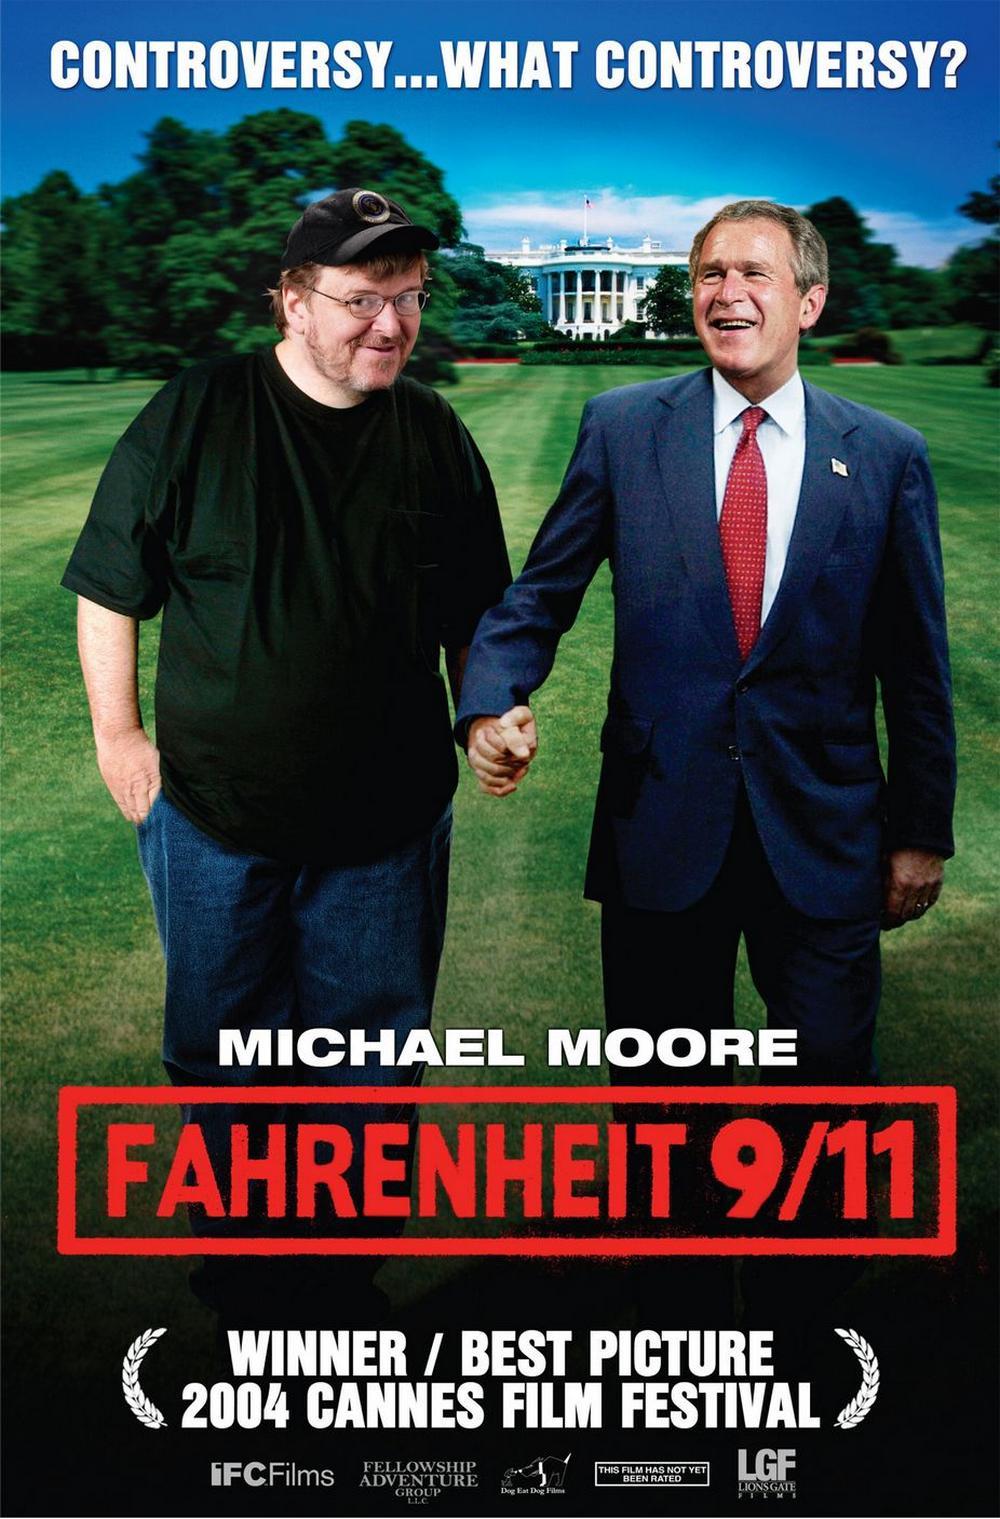 9/11 Film Dokumentation